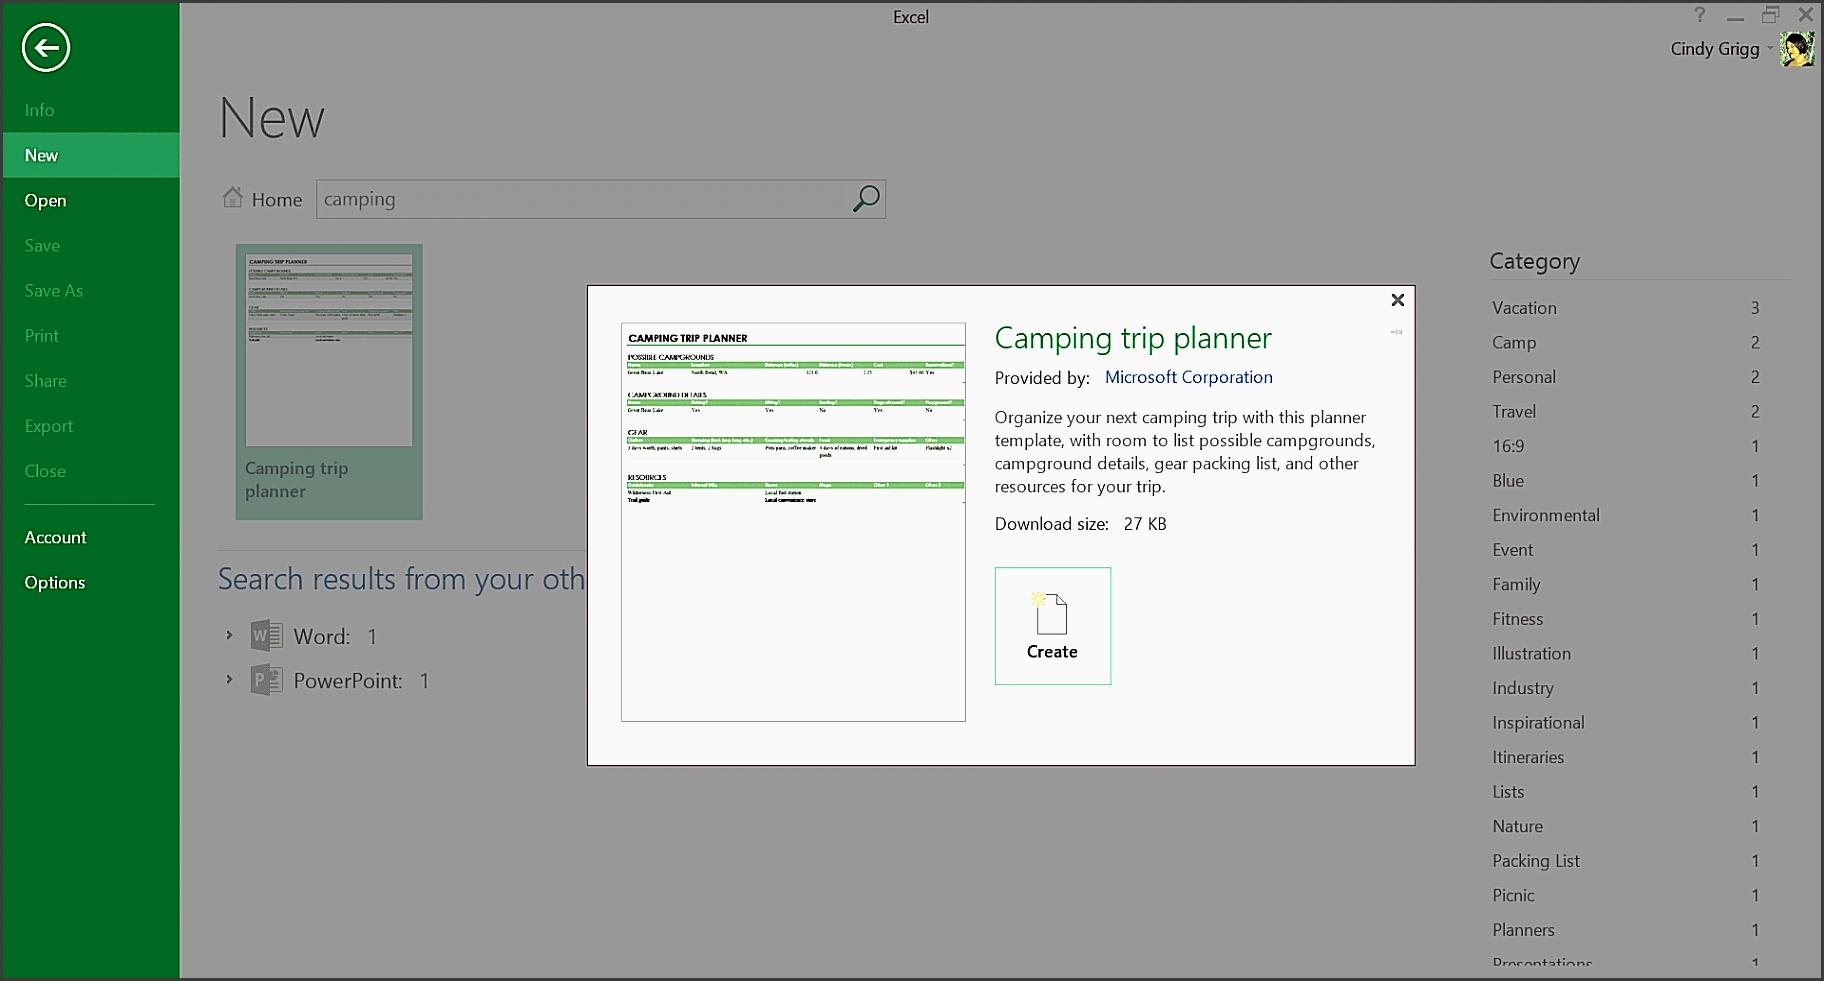 camping trip planner template for microsoft excel 58b8bb7f5f9b58af5c b